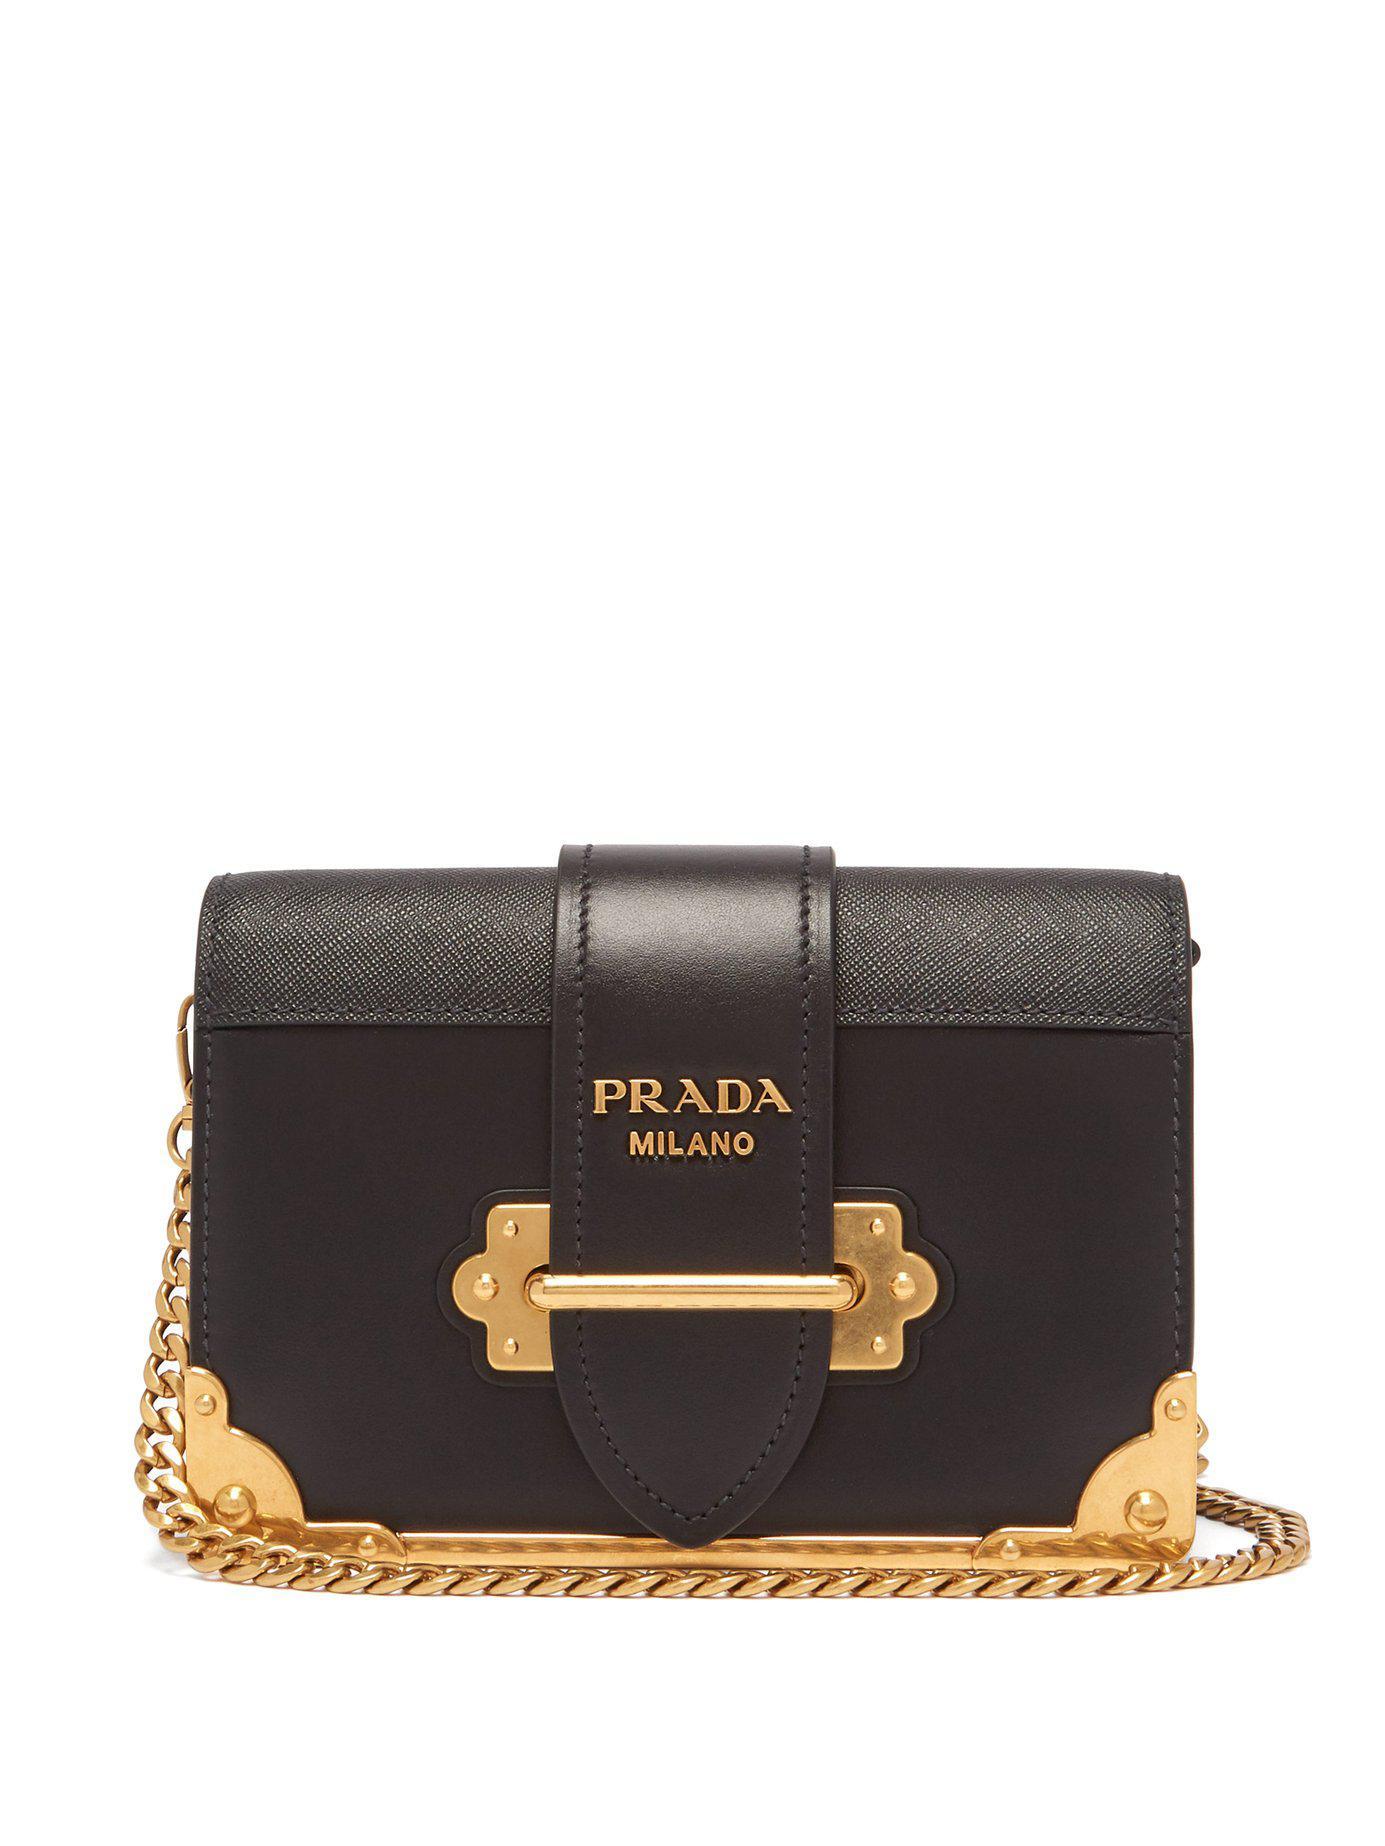 Lyst - Prada Cahier Leather Shoulder Bag in Black - Save 13% 8f17bdff37119